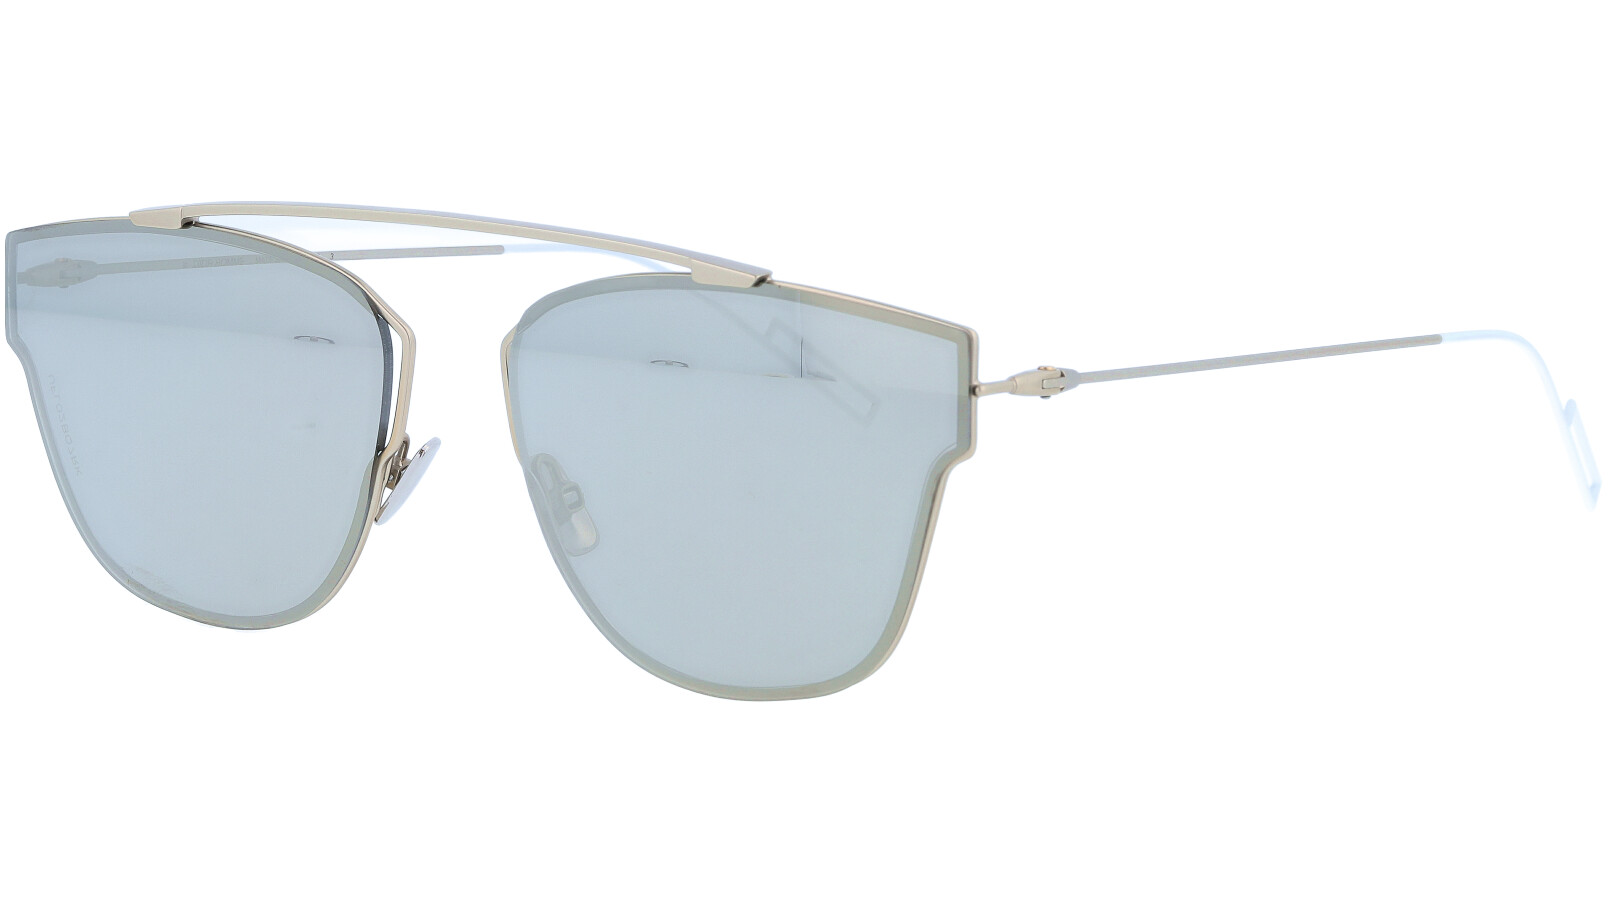 DIOR DIOR0204S CGSM3 57 LTGLD Sunglasses